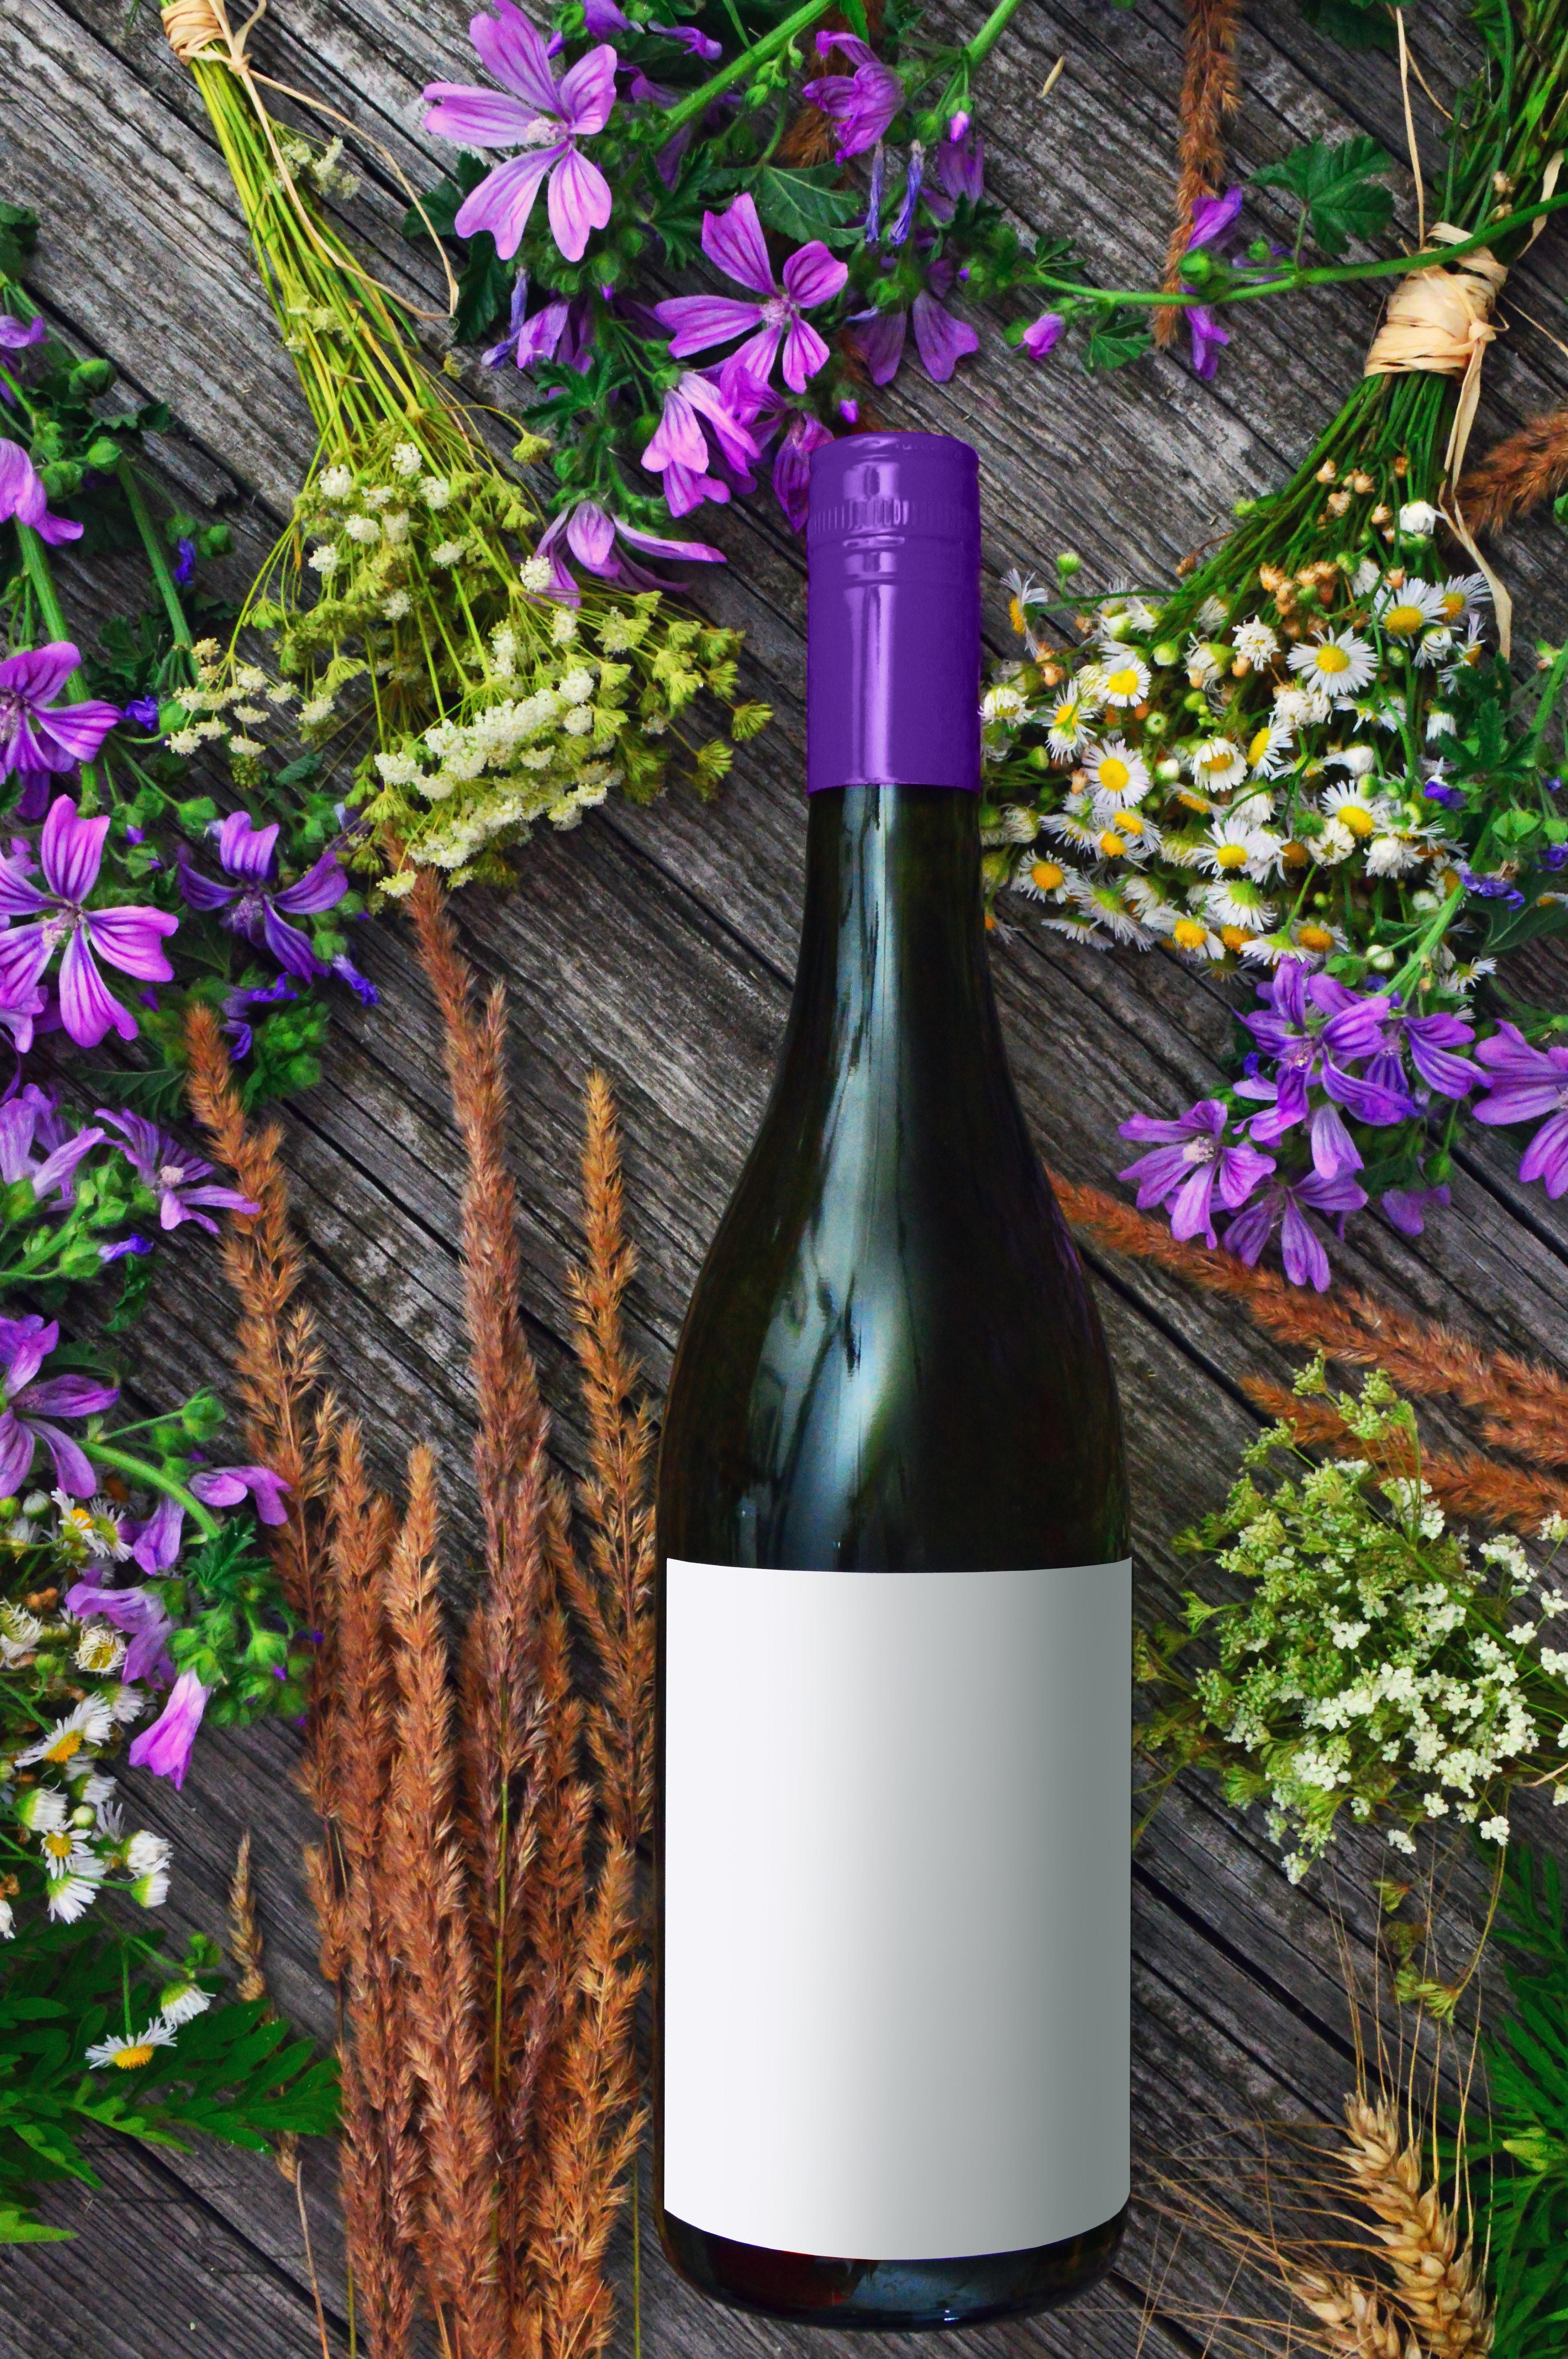 Photo Of Wine Bottles Near Flowers Free Stock Photo